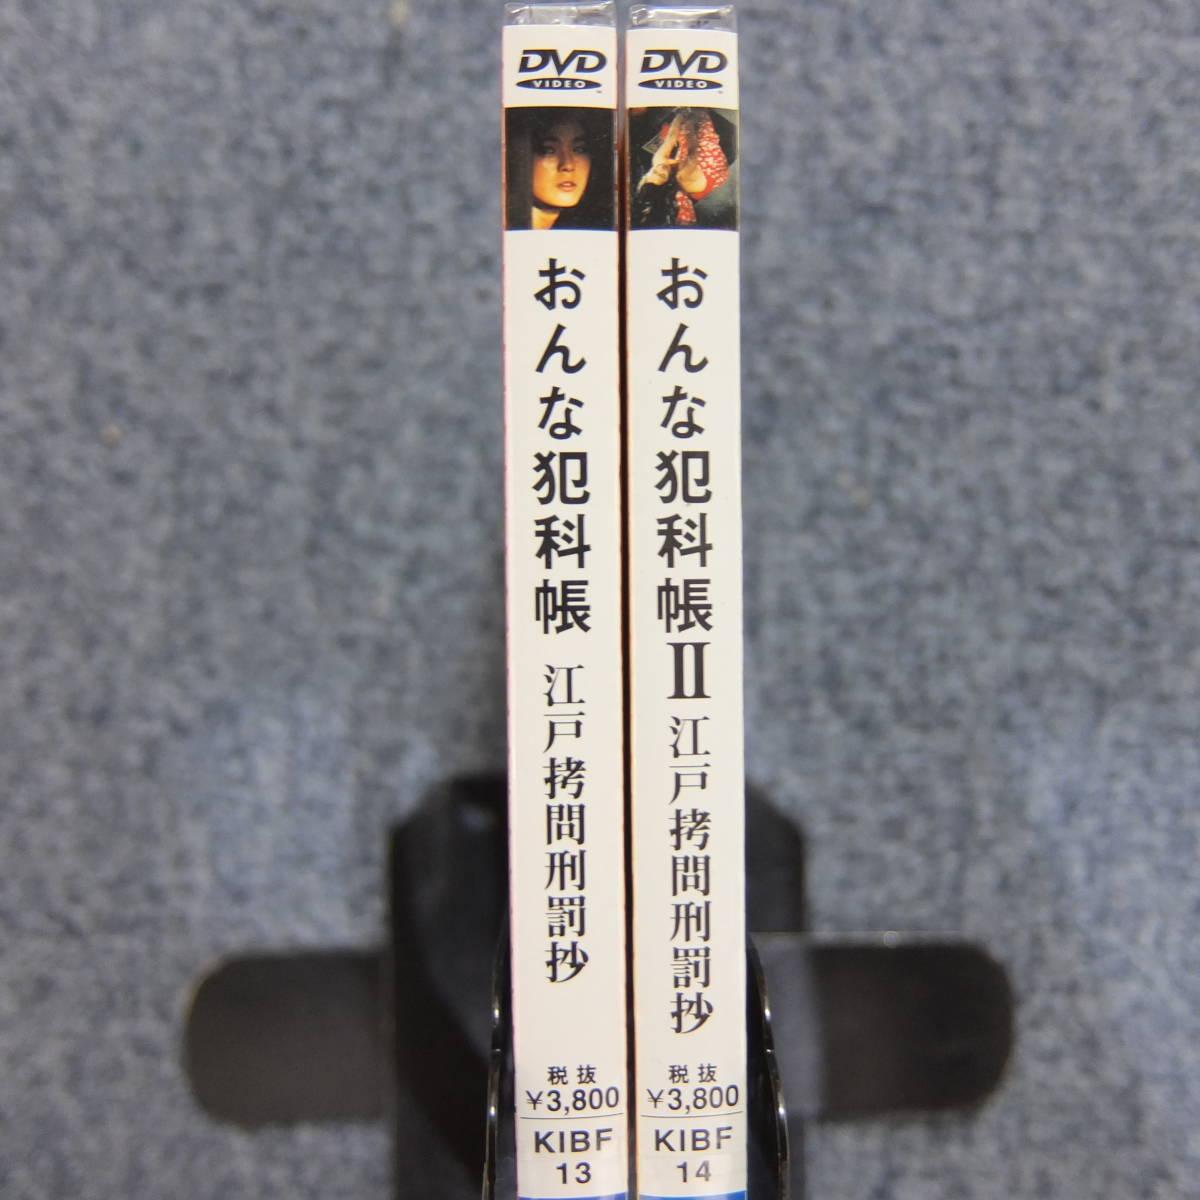 新品/DVD 【 おんな犯科帳 】 Ⅰ~Ⅱ 計2本 江戸拷問刑罰 石原良純 送料160円_画像6